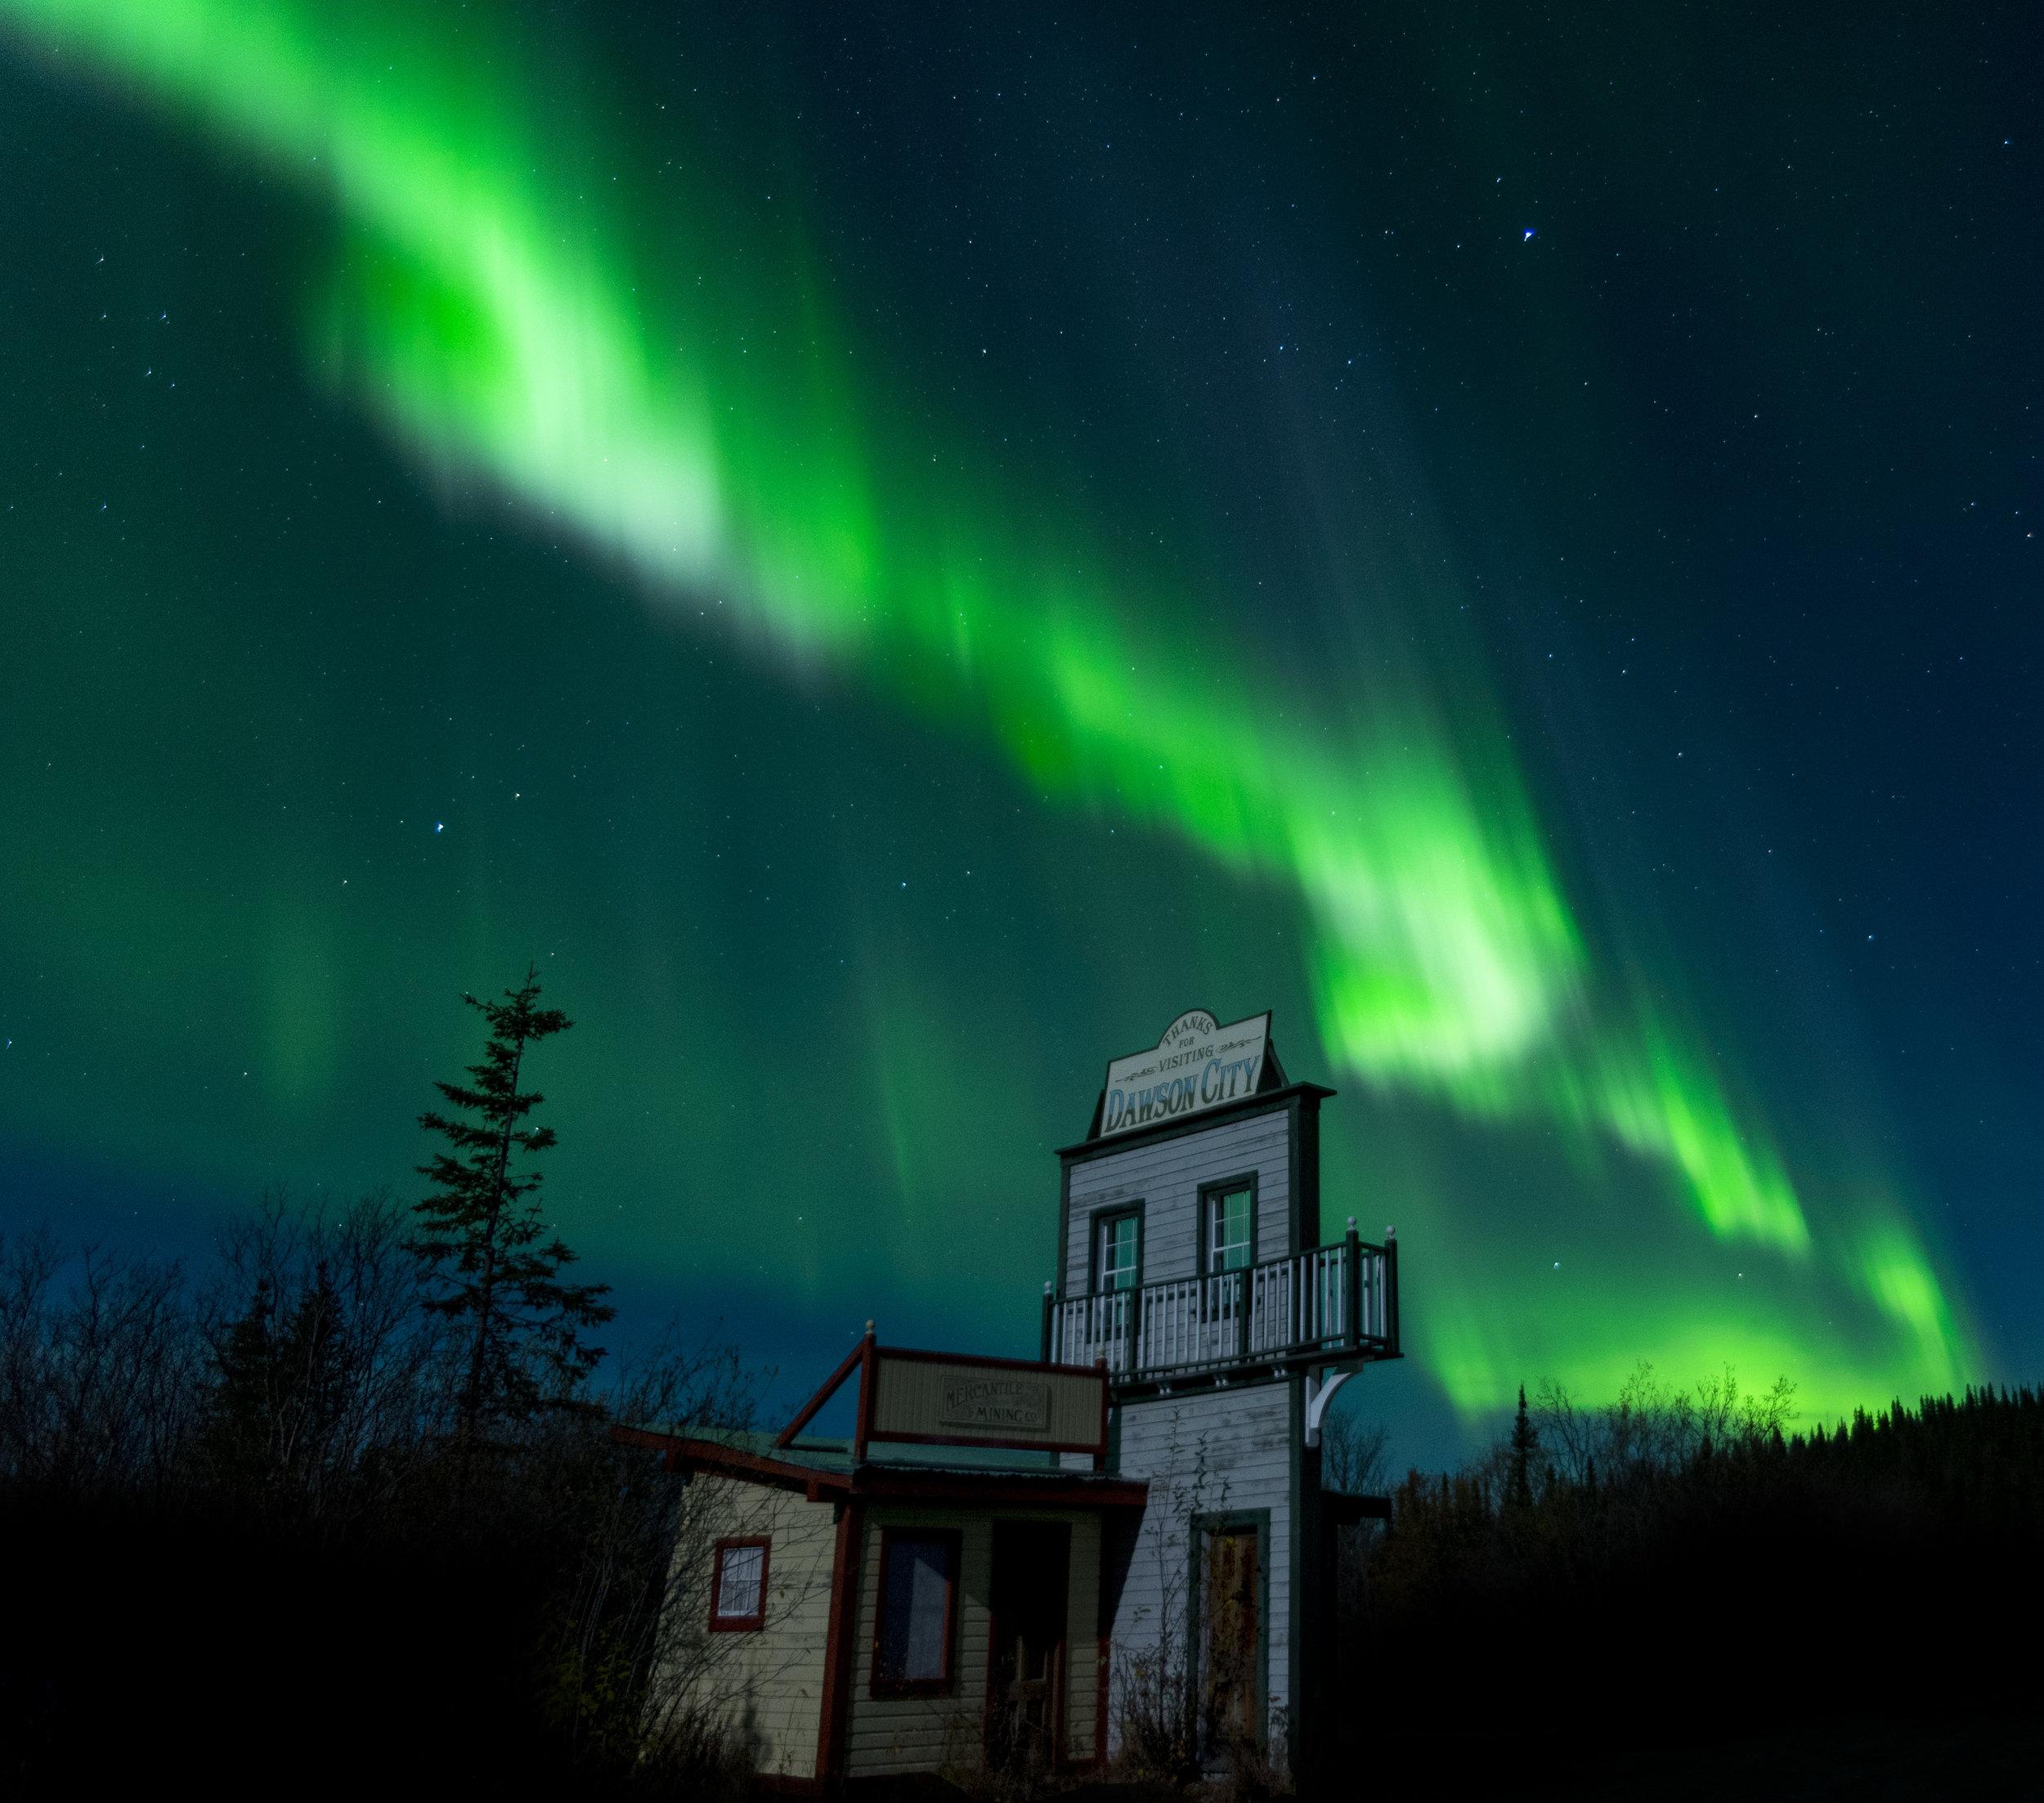 Dawson city northern lights photography workshop